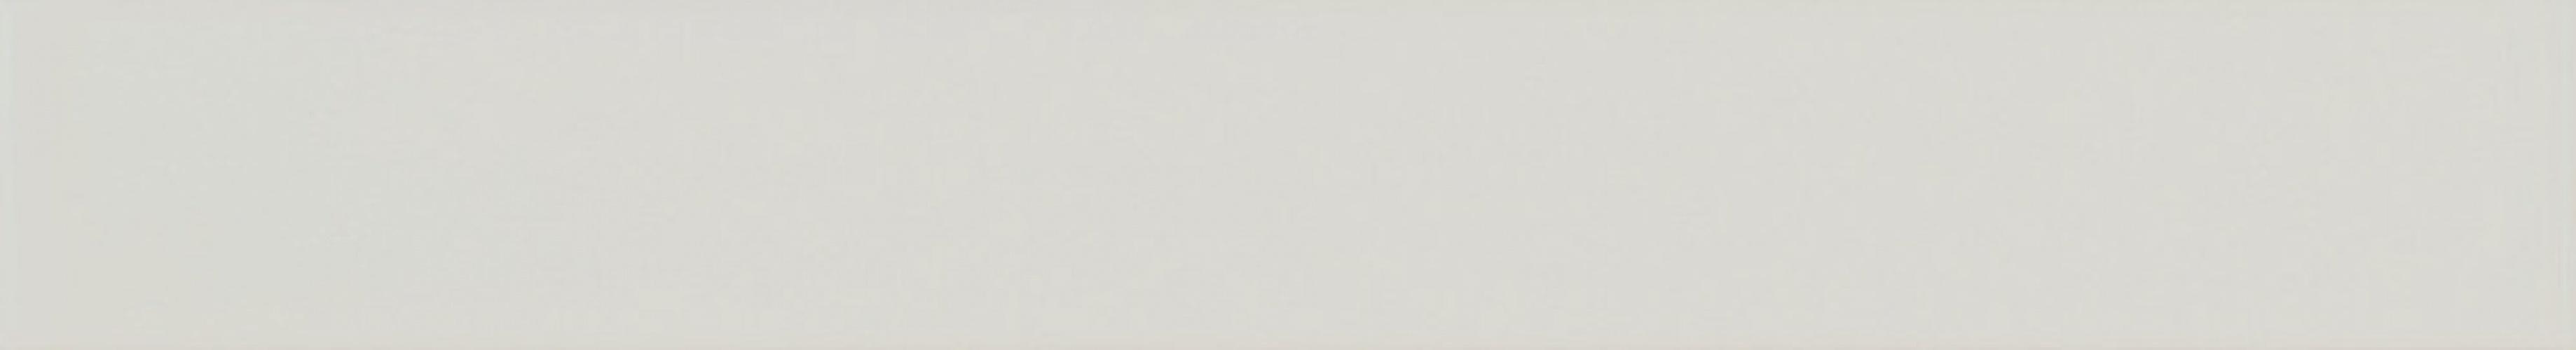 Настенная плитка Light Grey Brillo 50x400 / 7mm